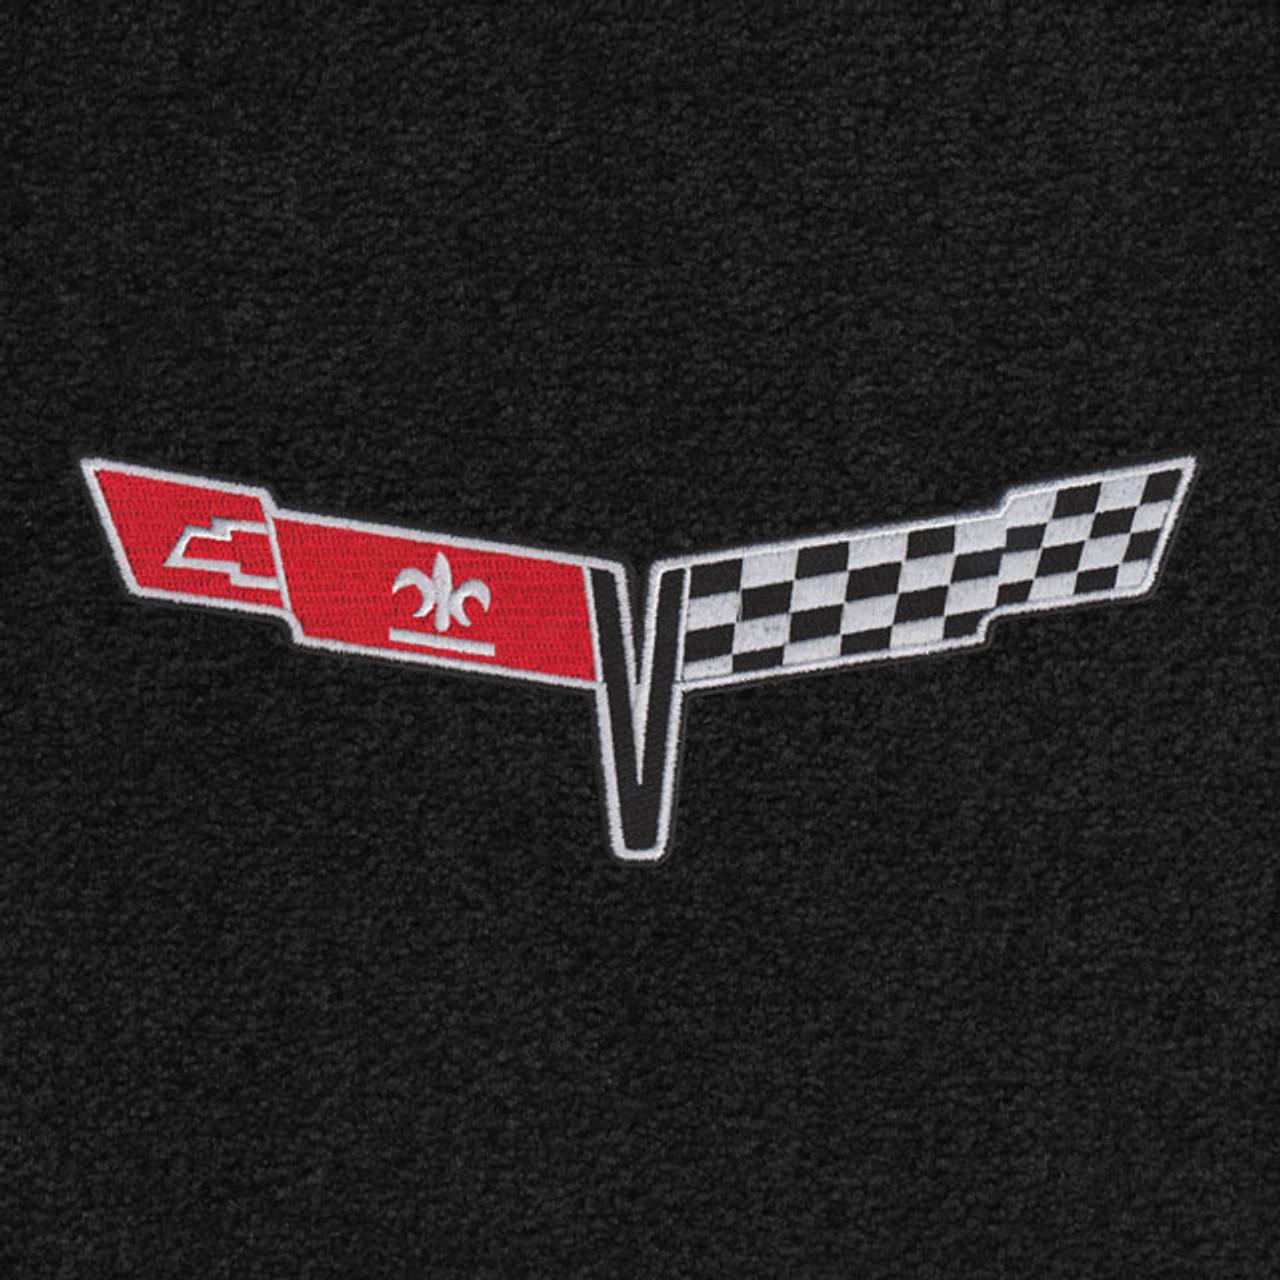 1980-1982 Cross Flags